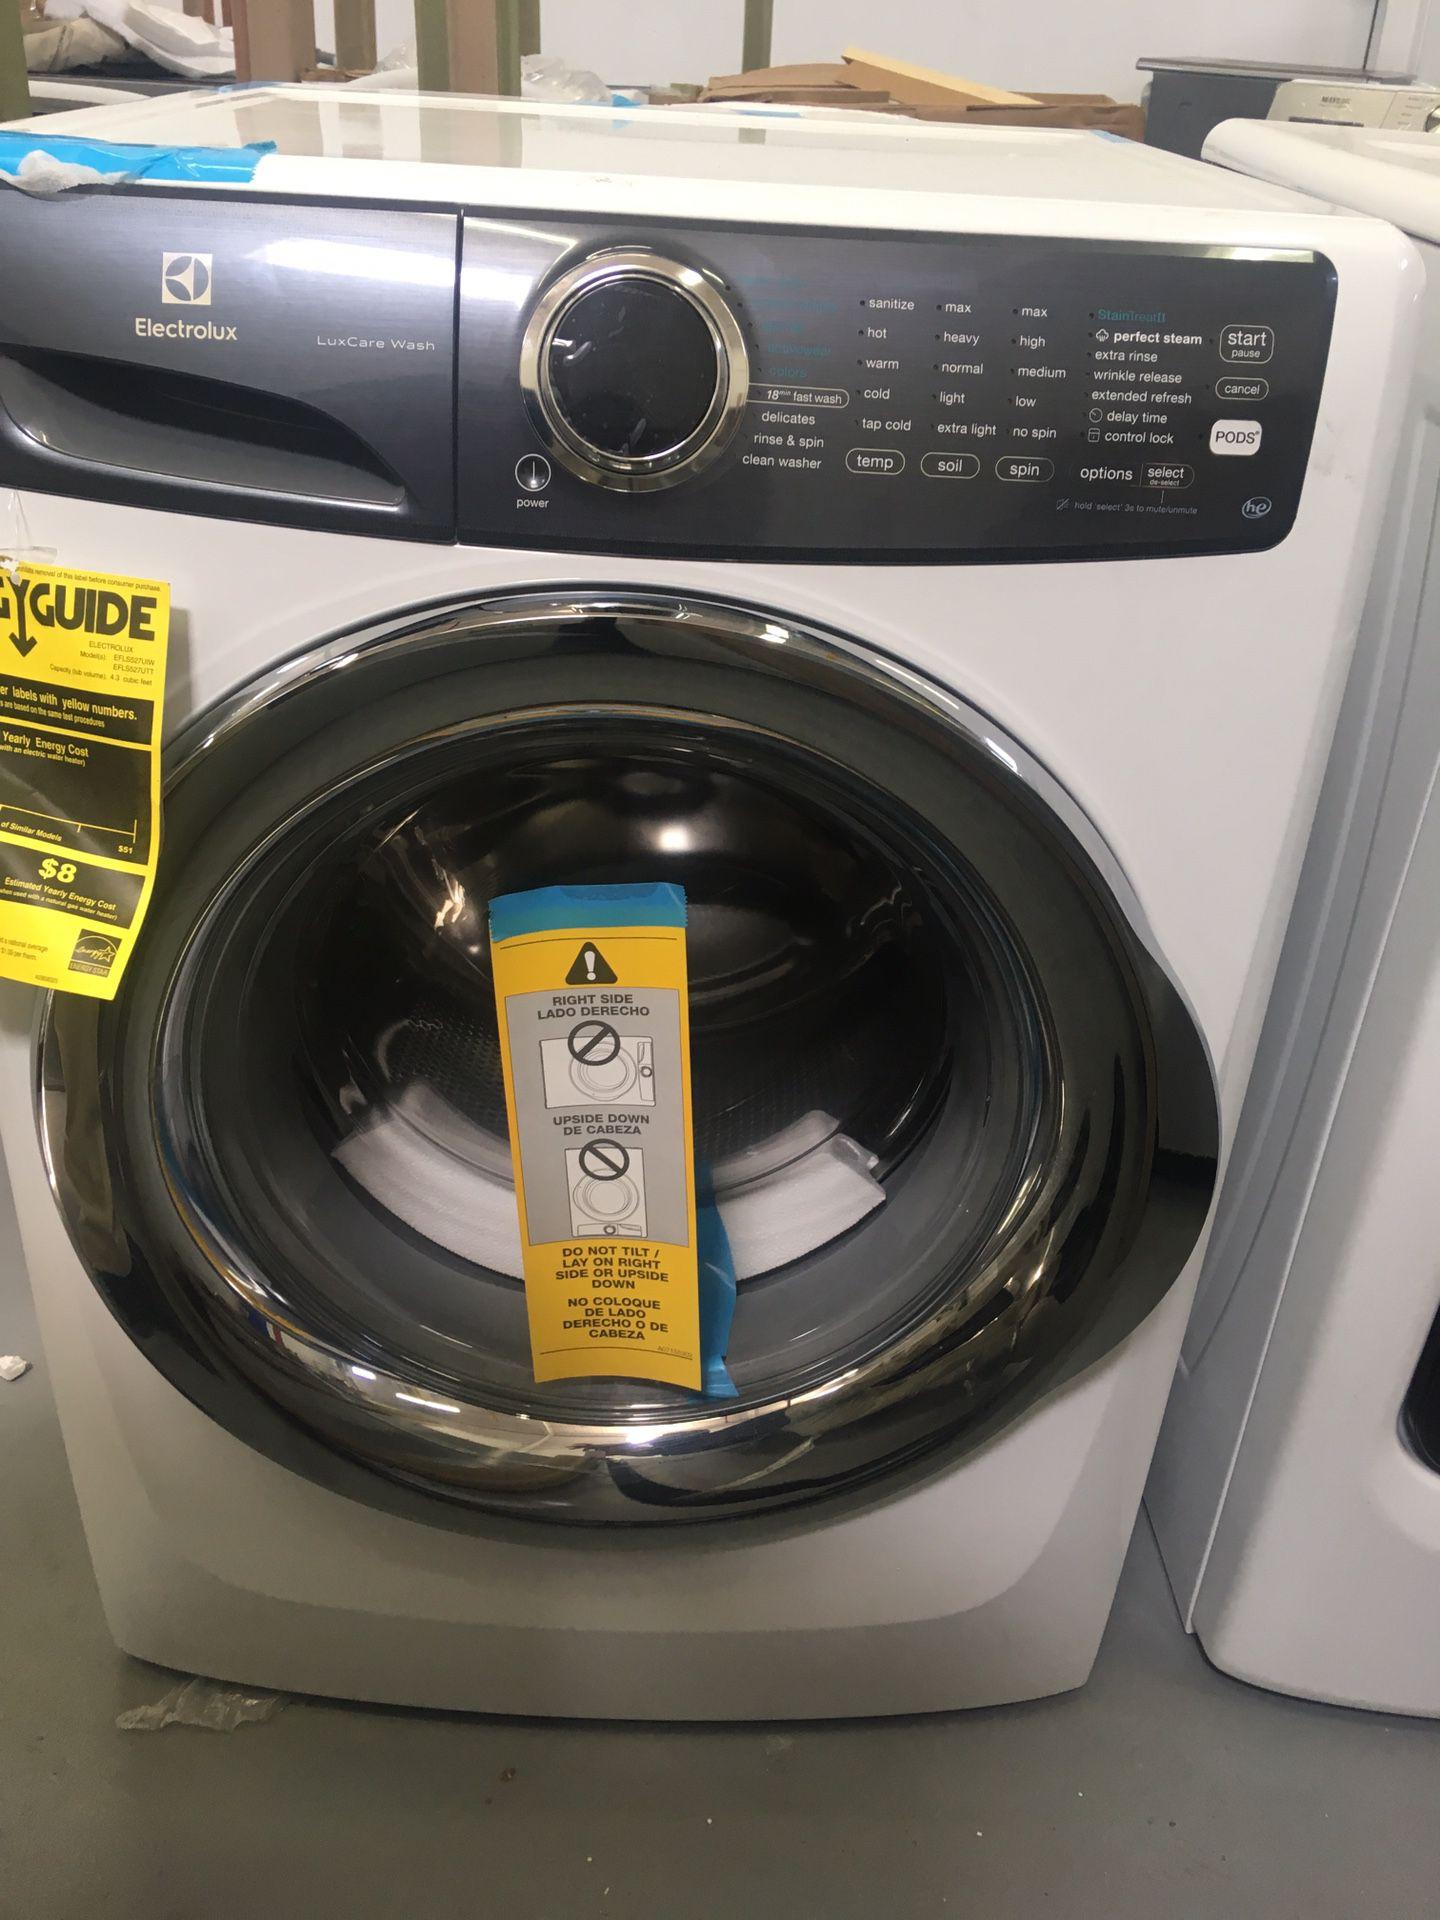 Brand new Electrolux washer